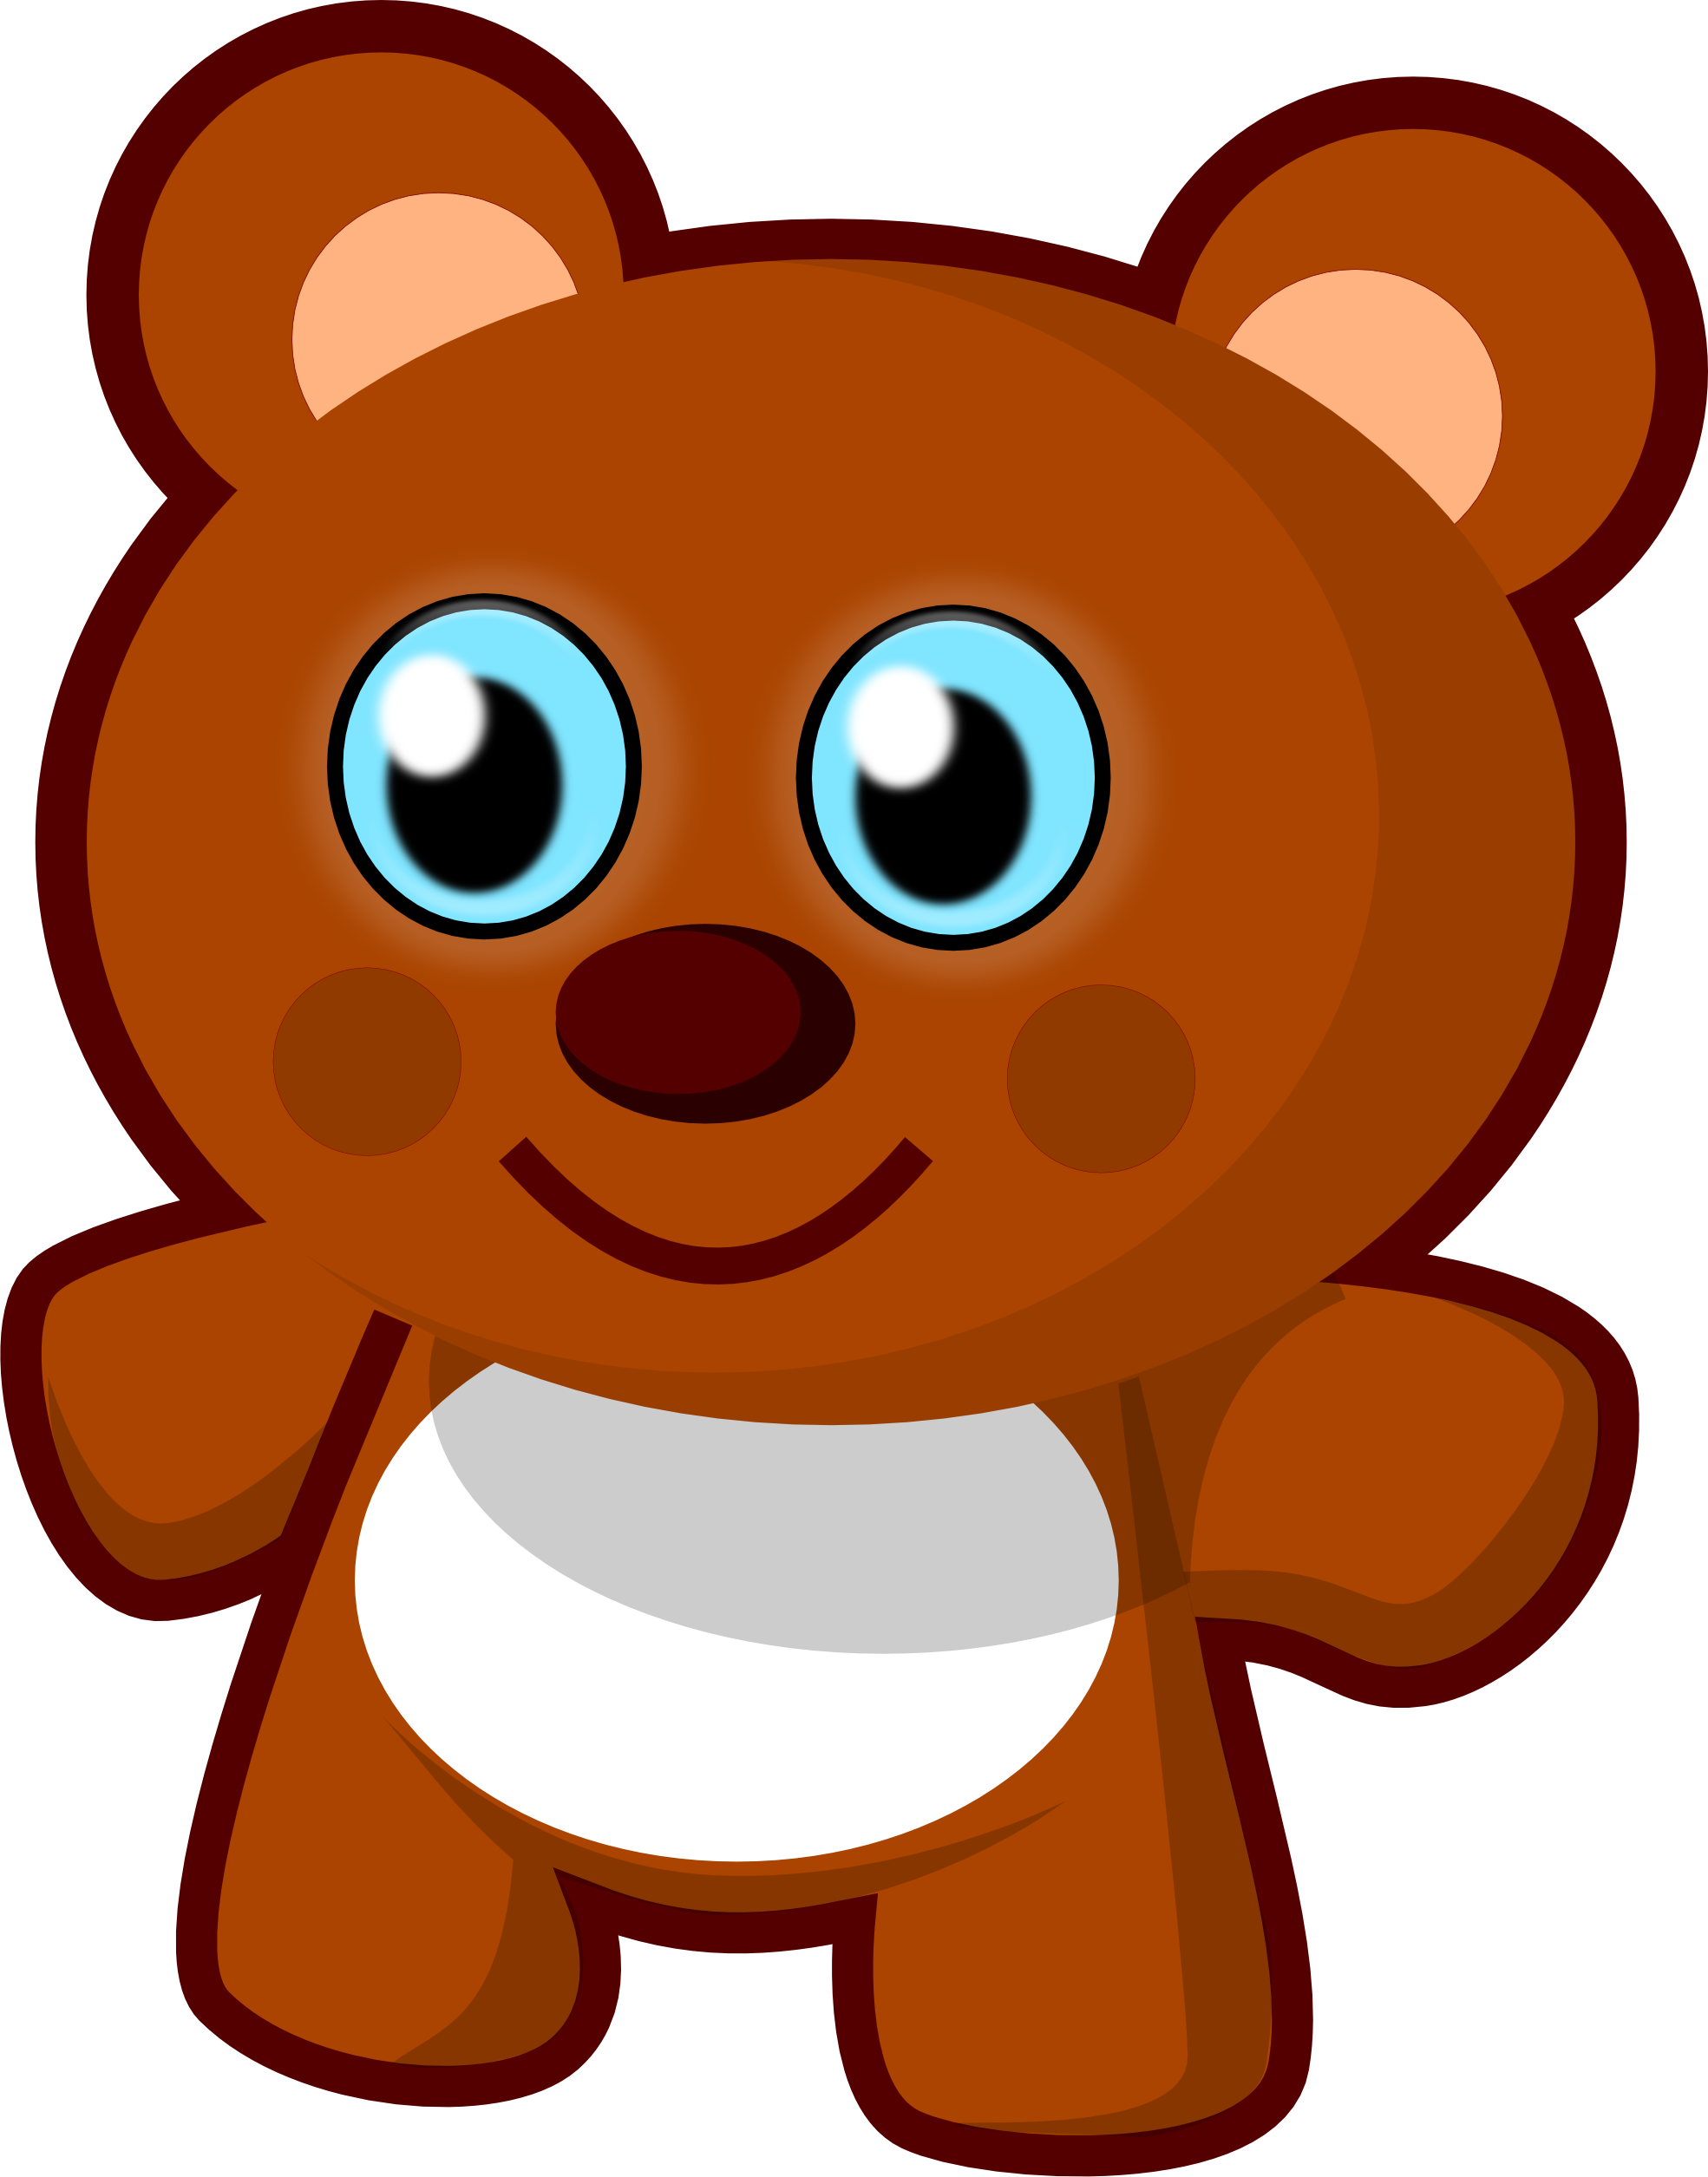 1969x2510 Free Clip Art Vector Design Of Little Bear Toy Svg Has Been